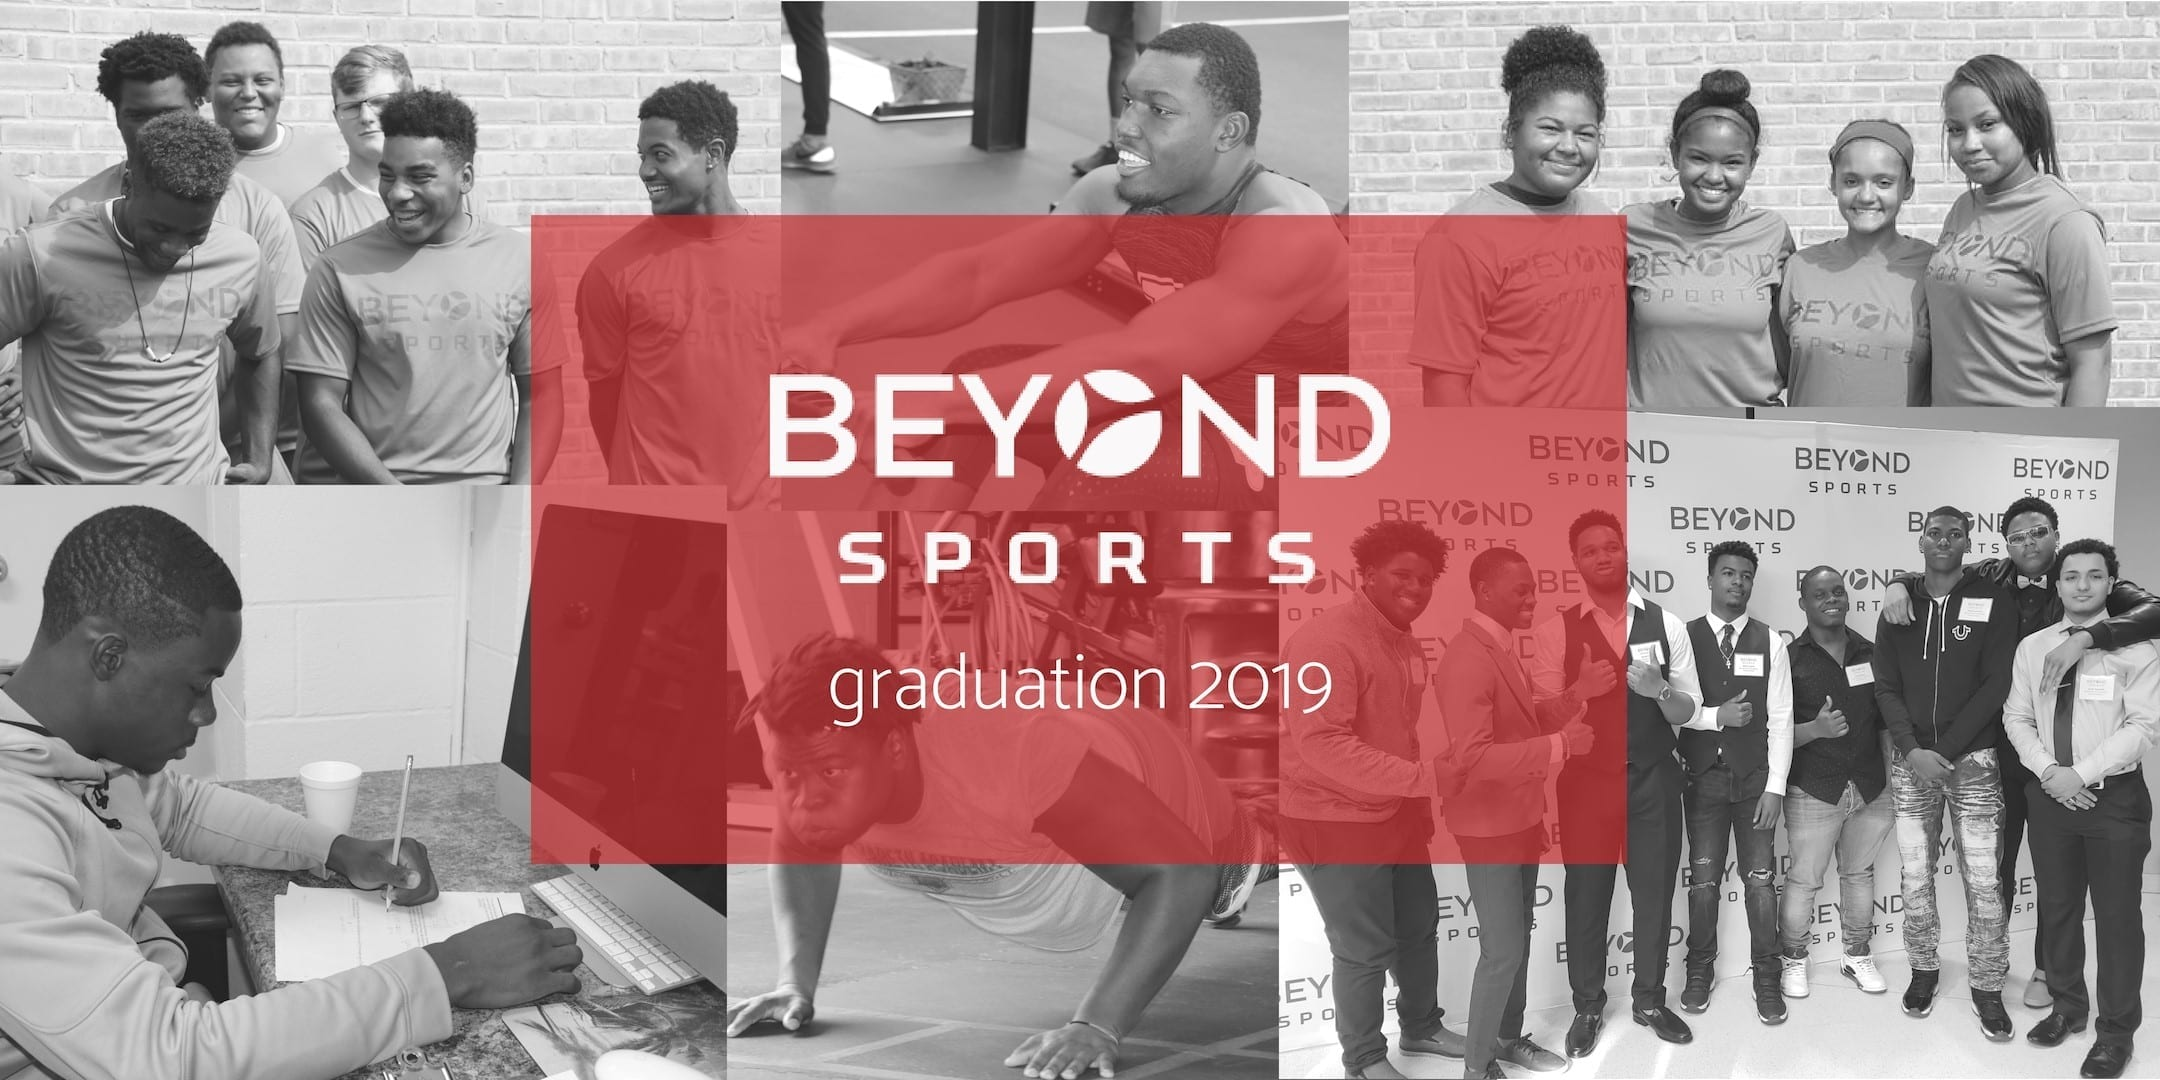 Beyond Sports Foundation Graduation 2019 | Beyond Sports